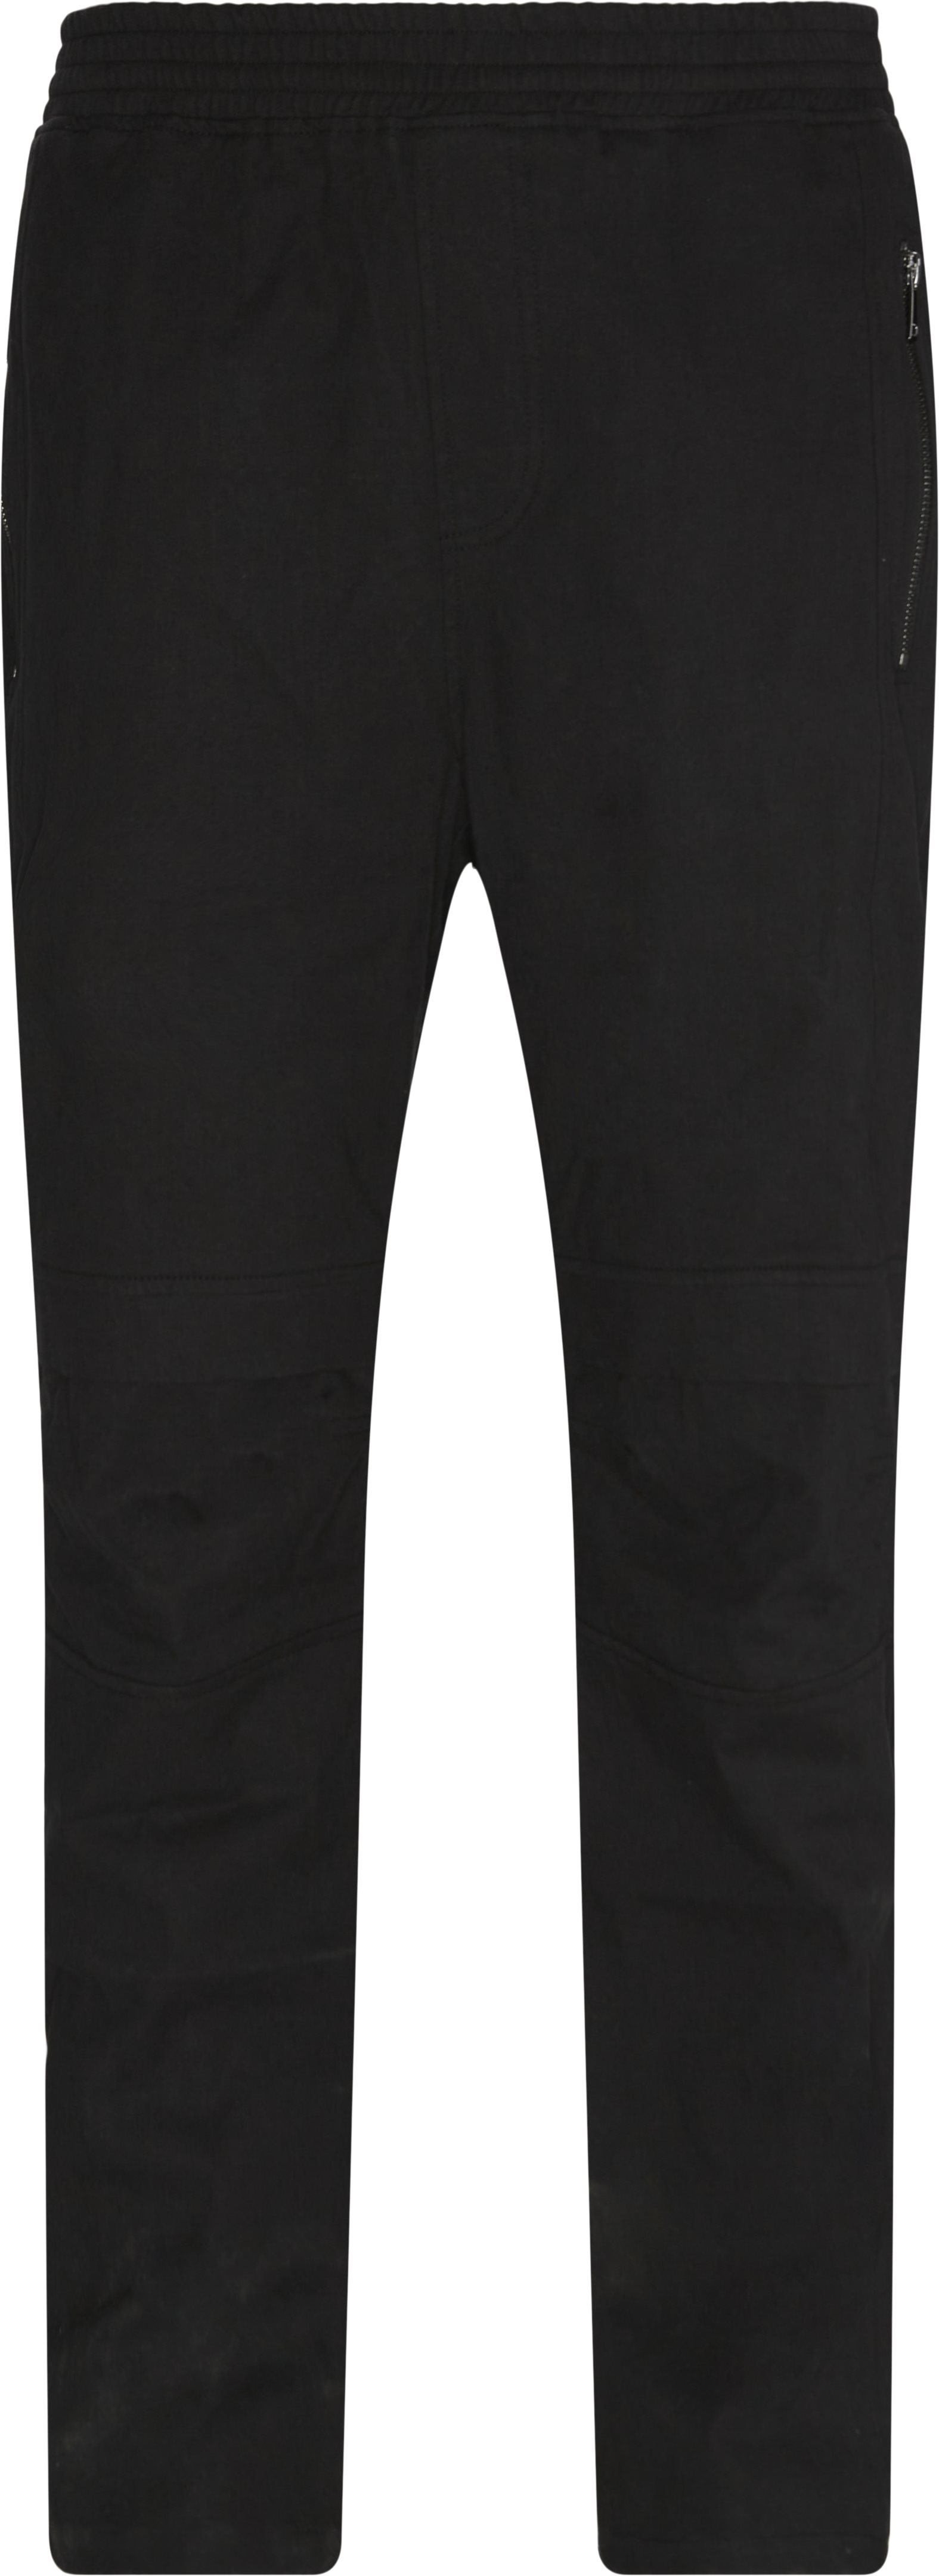 Felix Pants - Bukser - Regular fit - Sort